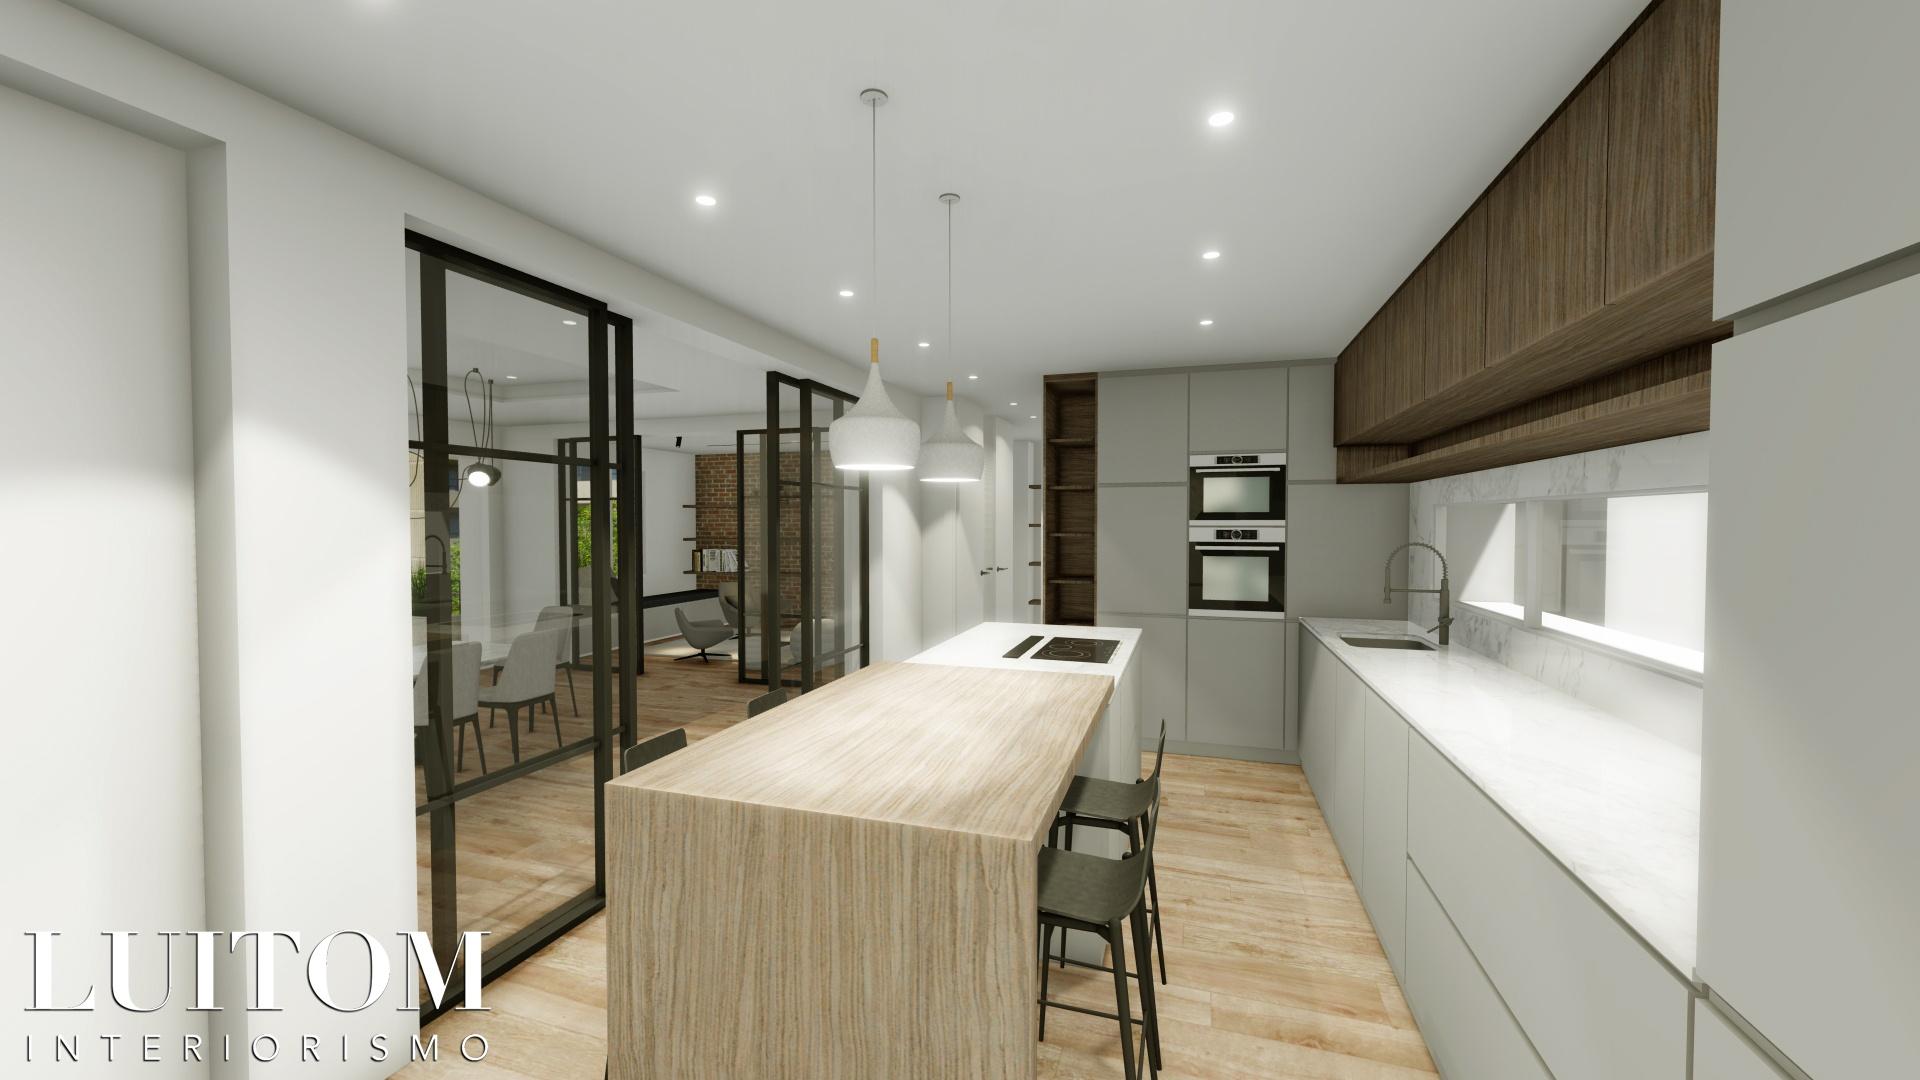 cristaleras-cocinas-pared-cristal-separacion-cocina-salon-cristalera-metalica-madera-blanca-negra-25